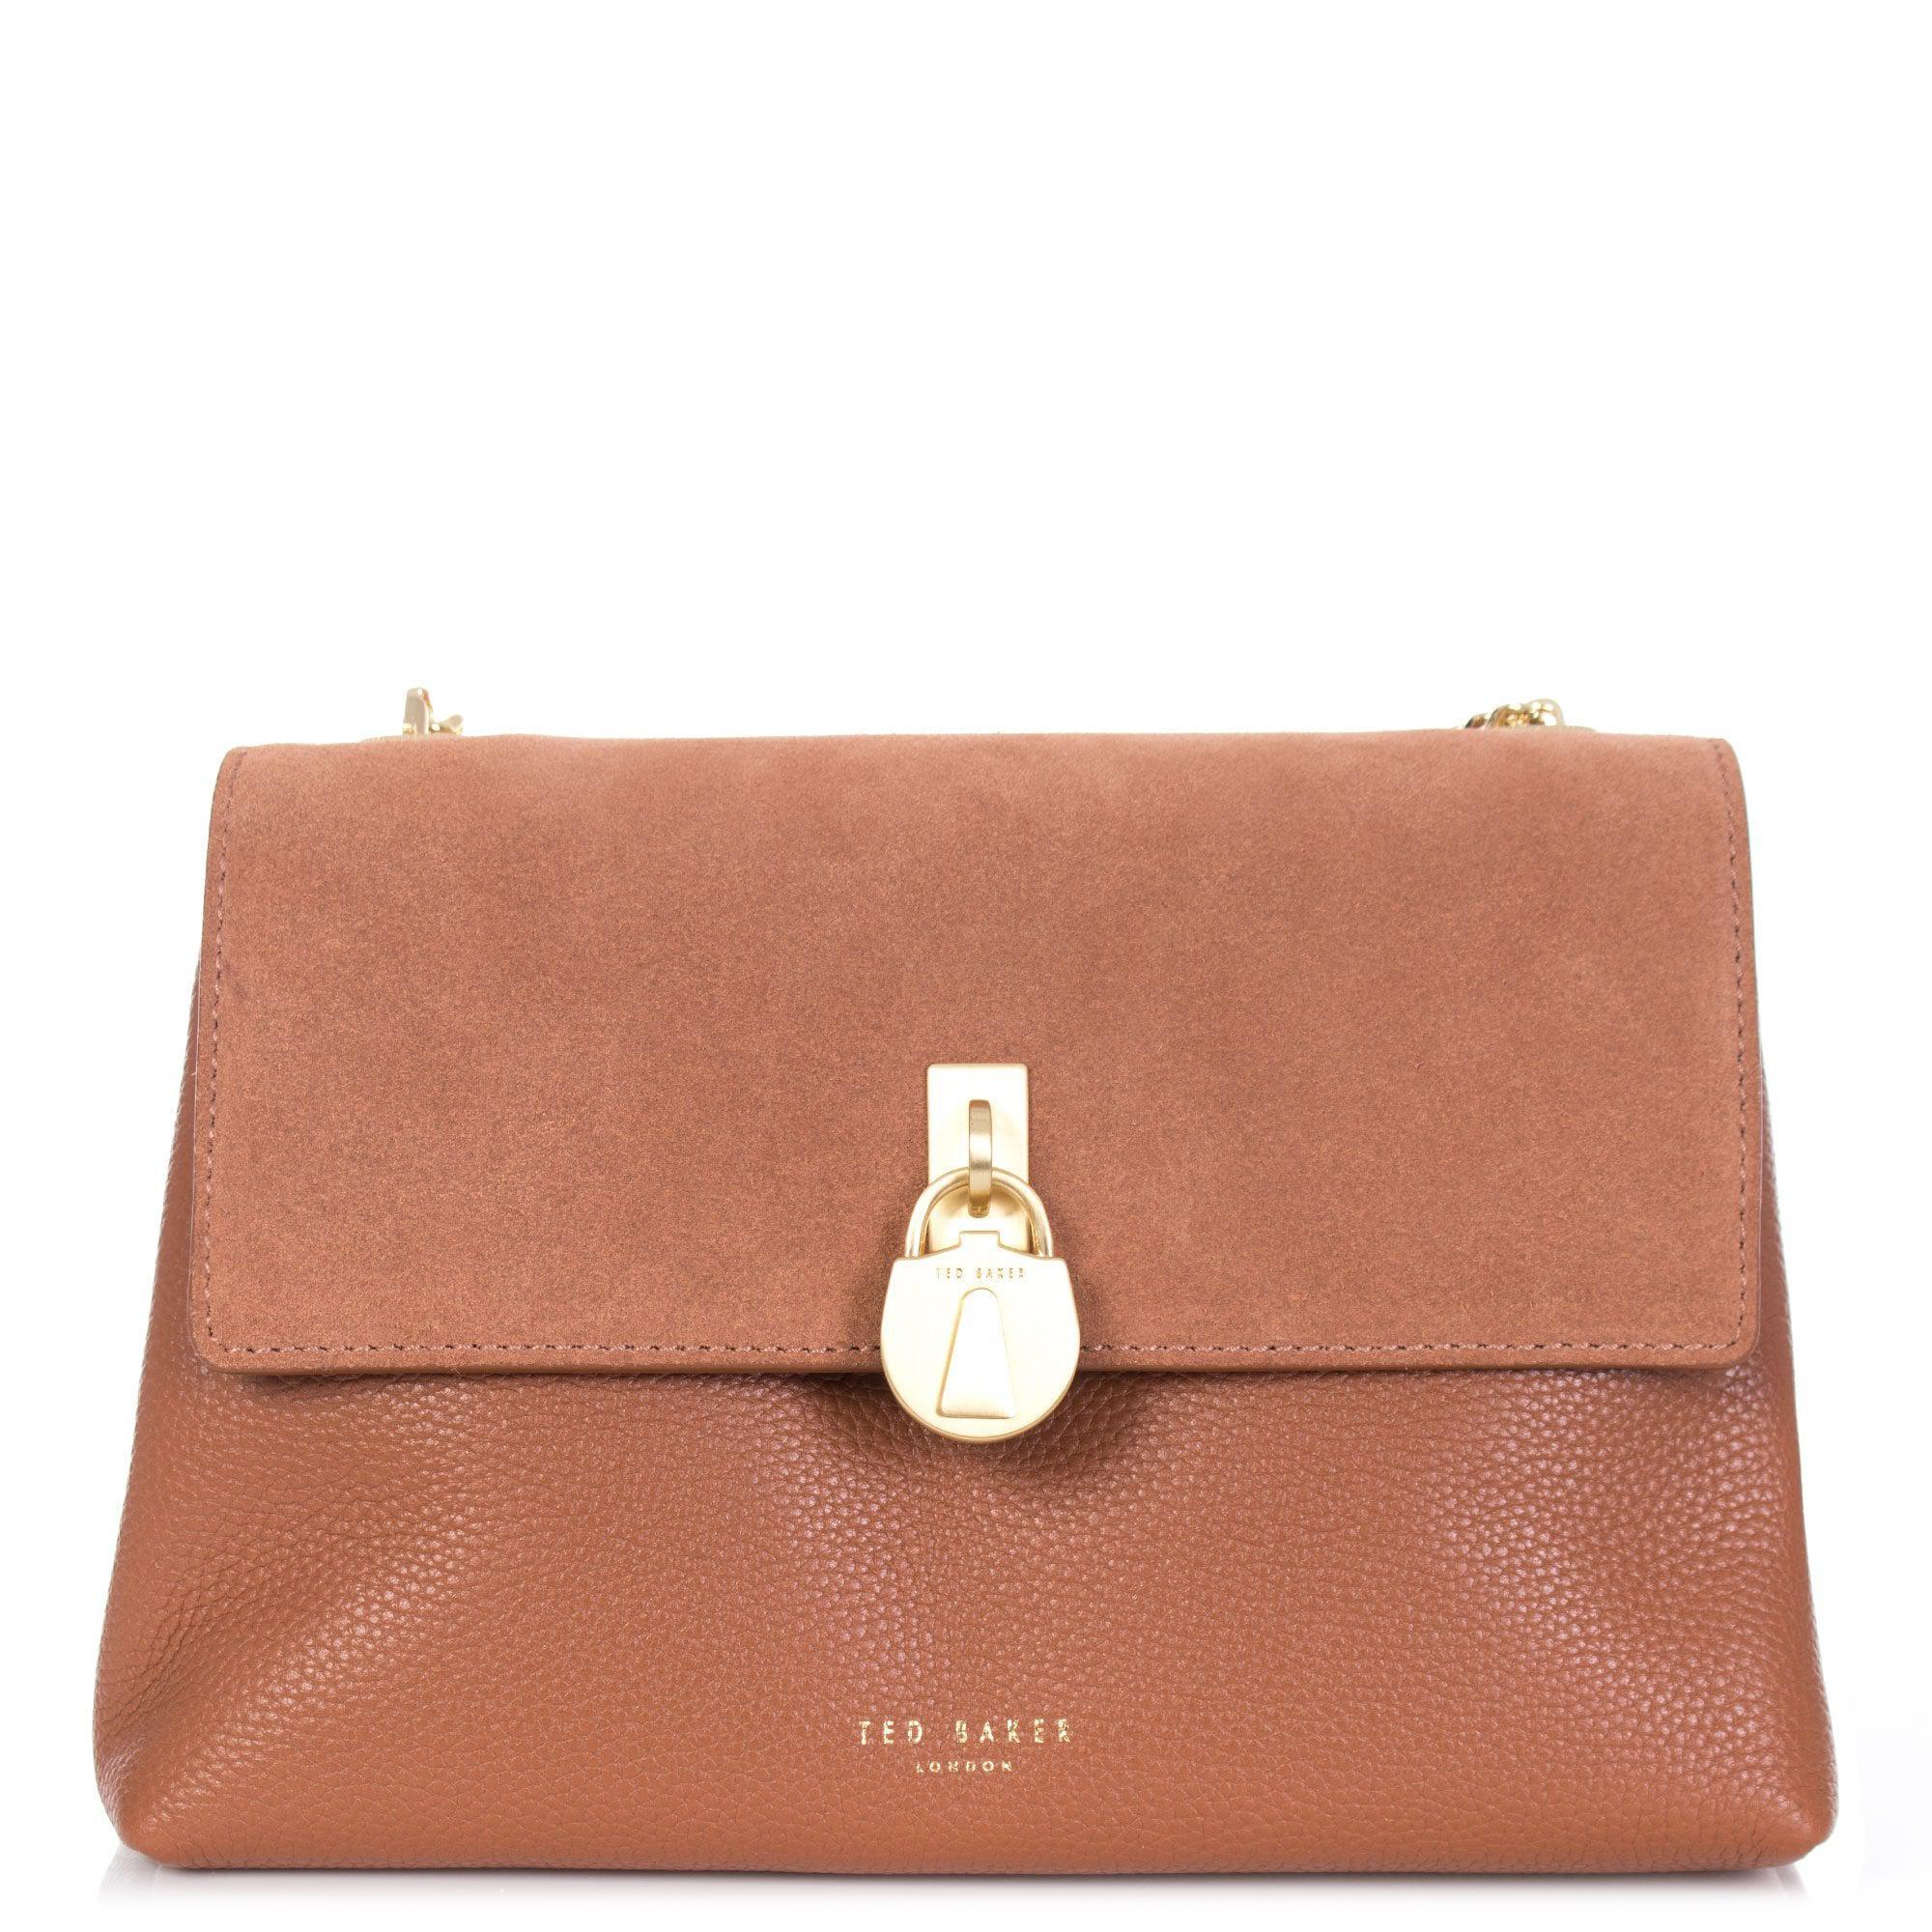 0f13204b915 Ted Baker Helena Leather & Suede Padlock Shoulder Bag in Brown - Lyst